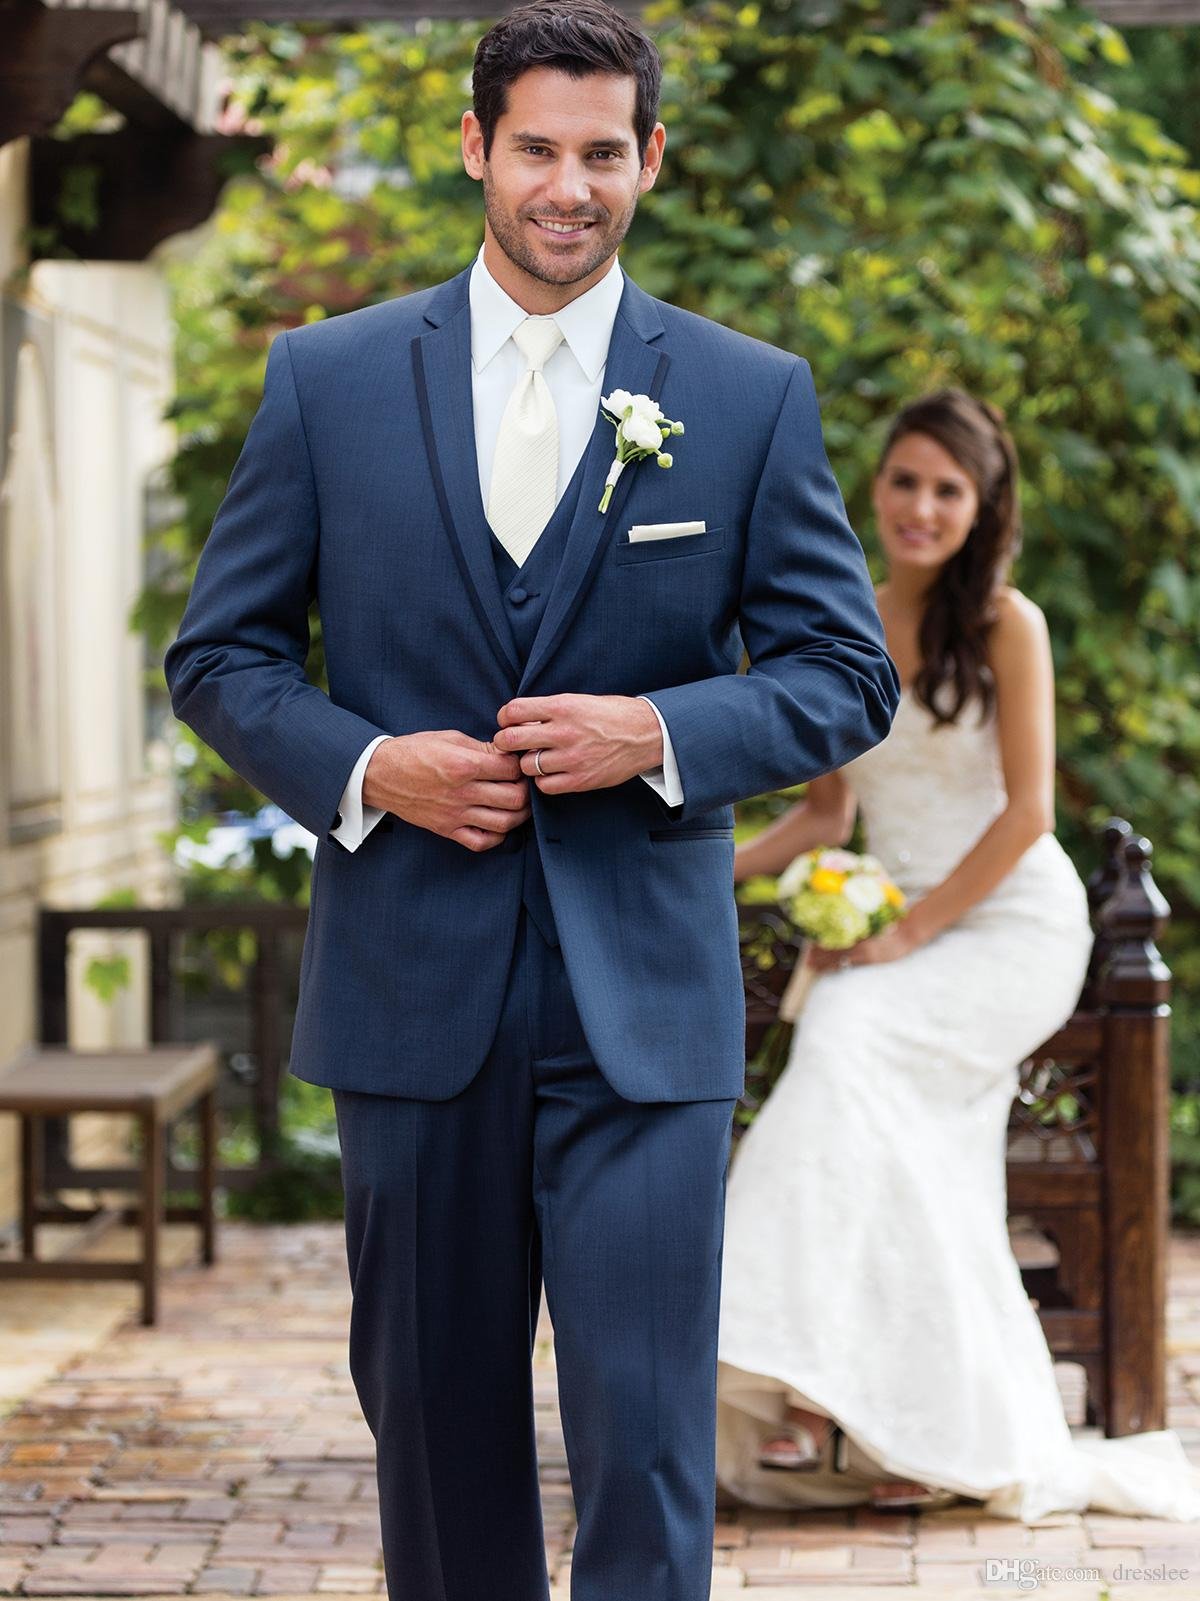 Cheap 2016 Custom Made Wear Navy Blue Suit Groom Tuxedos Grooms ...